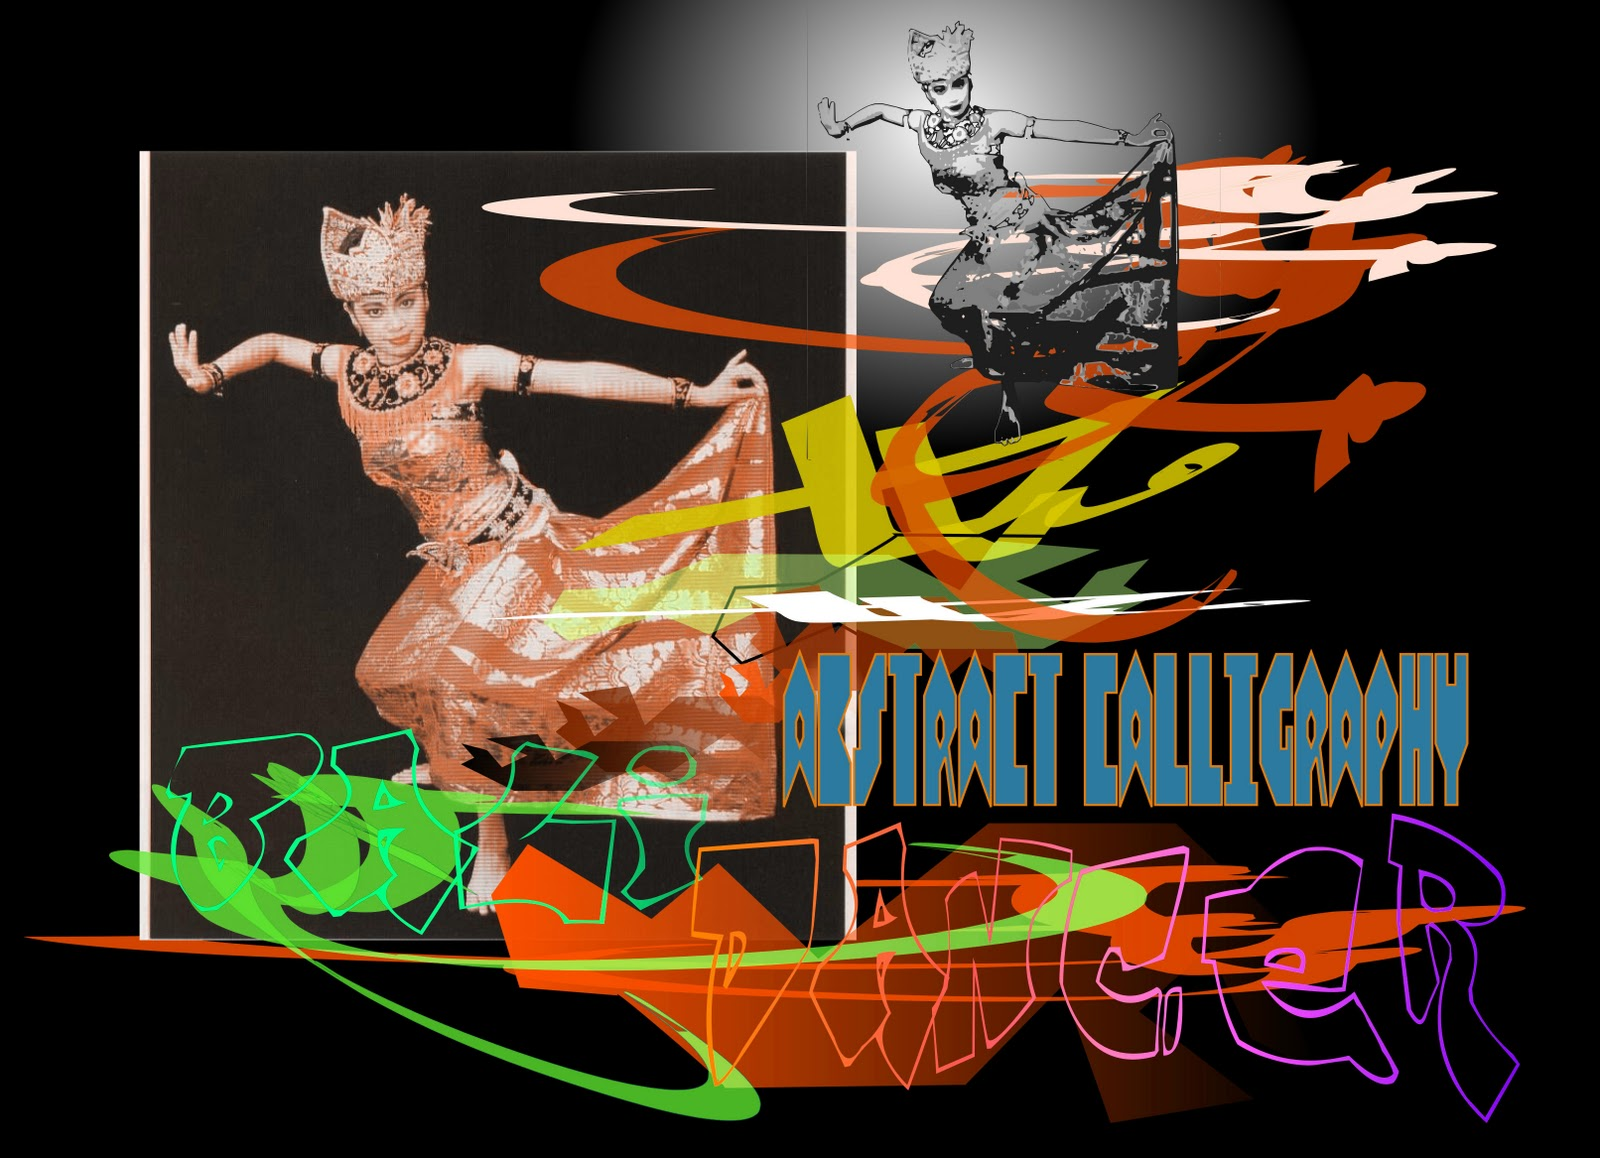 http://1.bp.blogspot.com/-2Lj5tAhgWFQ/TnQVTip1mRI/AAAAAAAAAwM/Lfg1Z4EoMm8/s1600/ACGbalidancer12dJPG.jpg